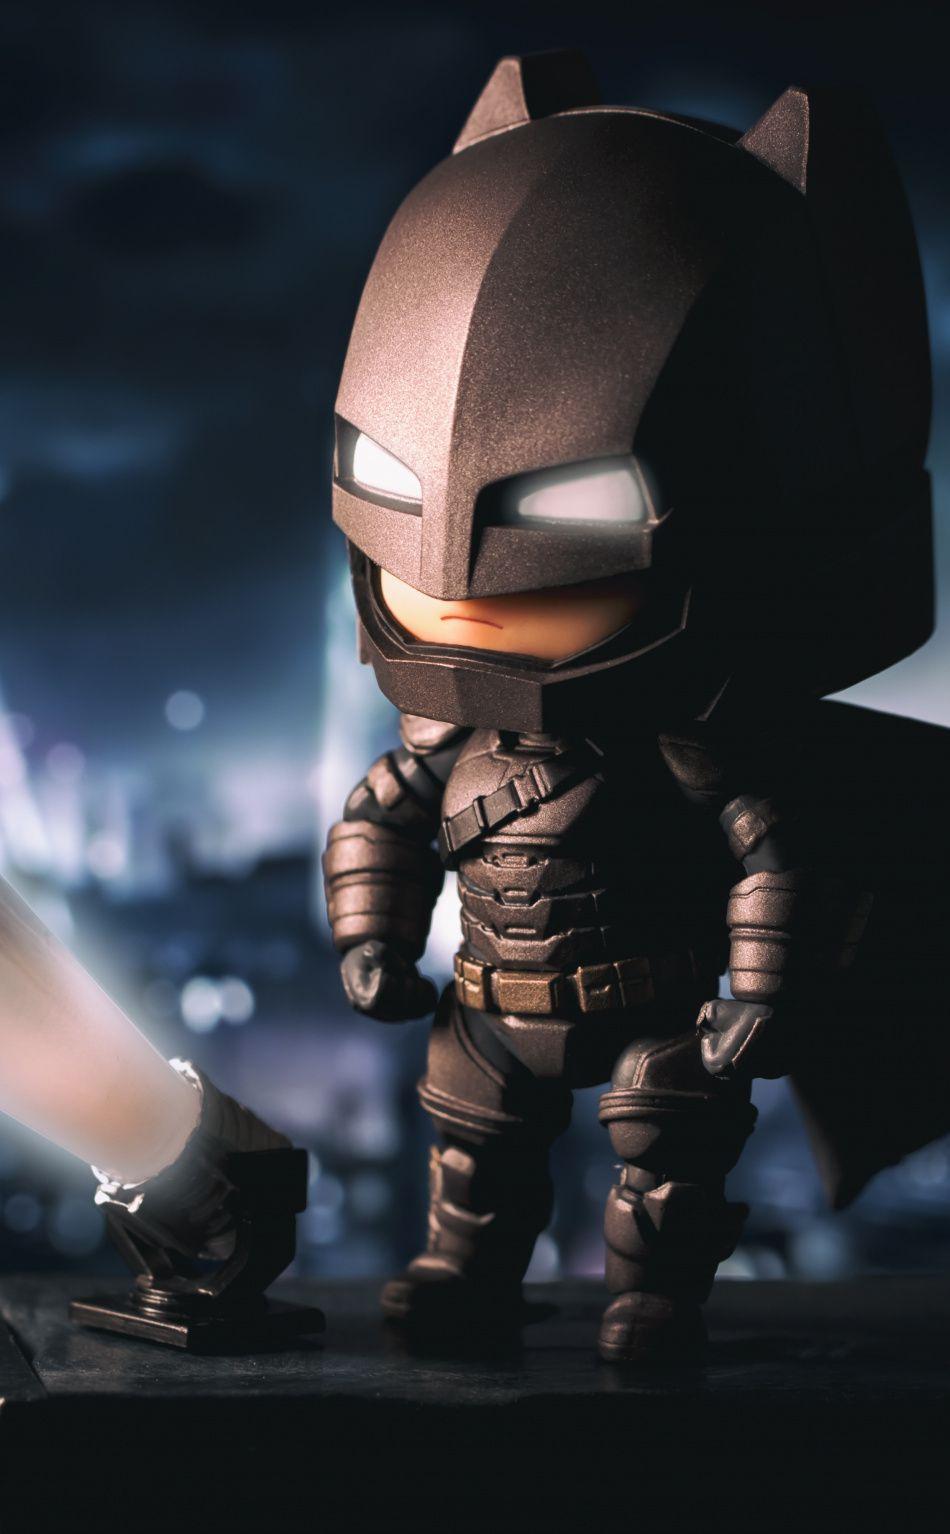 Official Dc Chibi Characters The Dark Knight Displate Artwork By Artist Dc Comics Part Of A Set Featuring De Batman Cartoon Baby Batman Batman And Catwoman